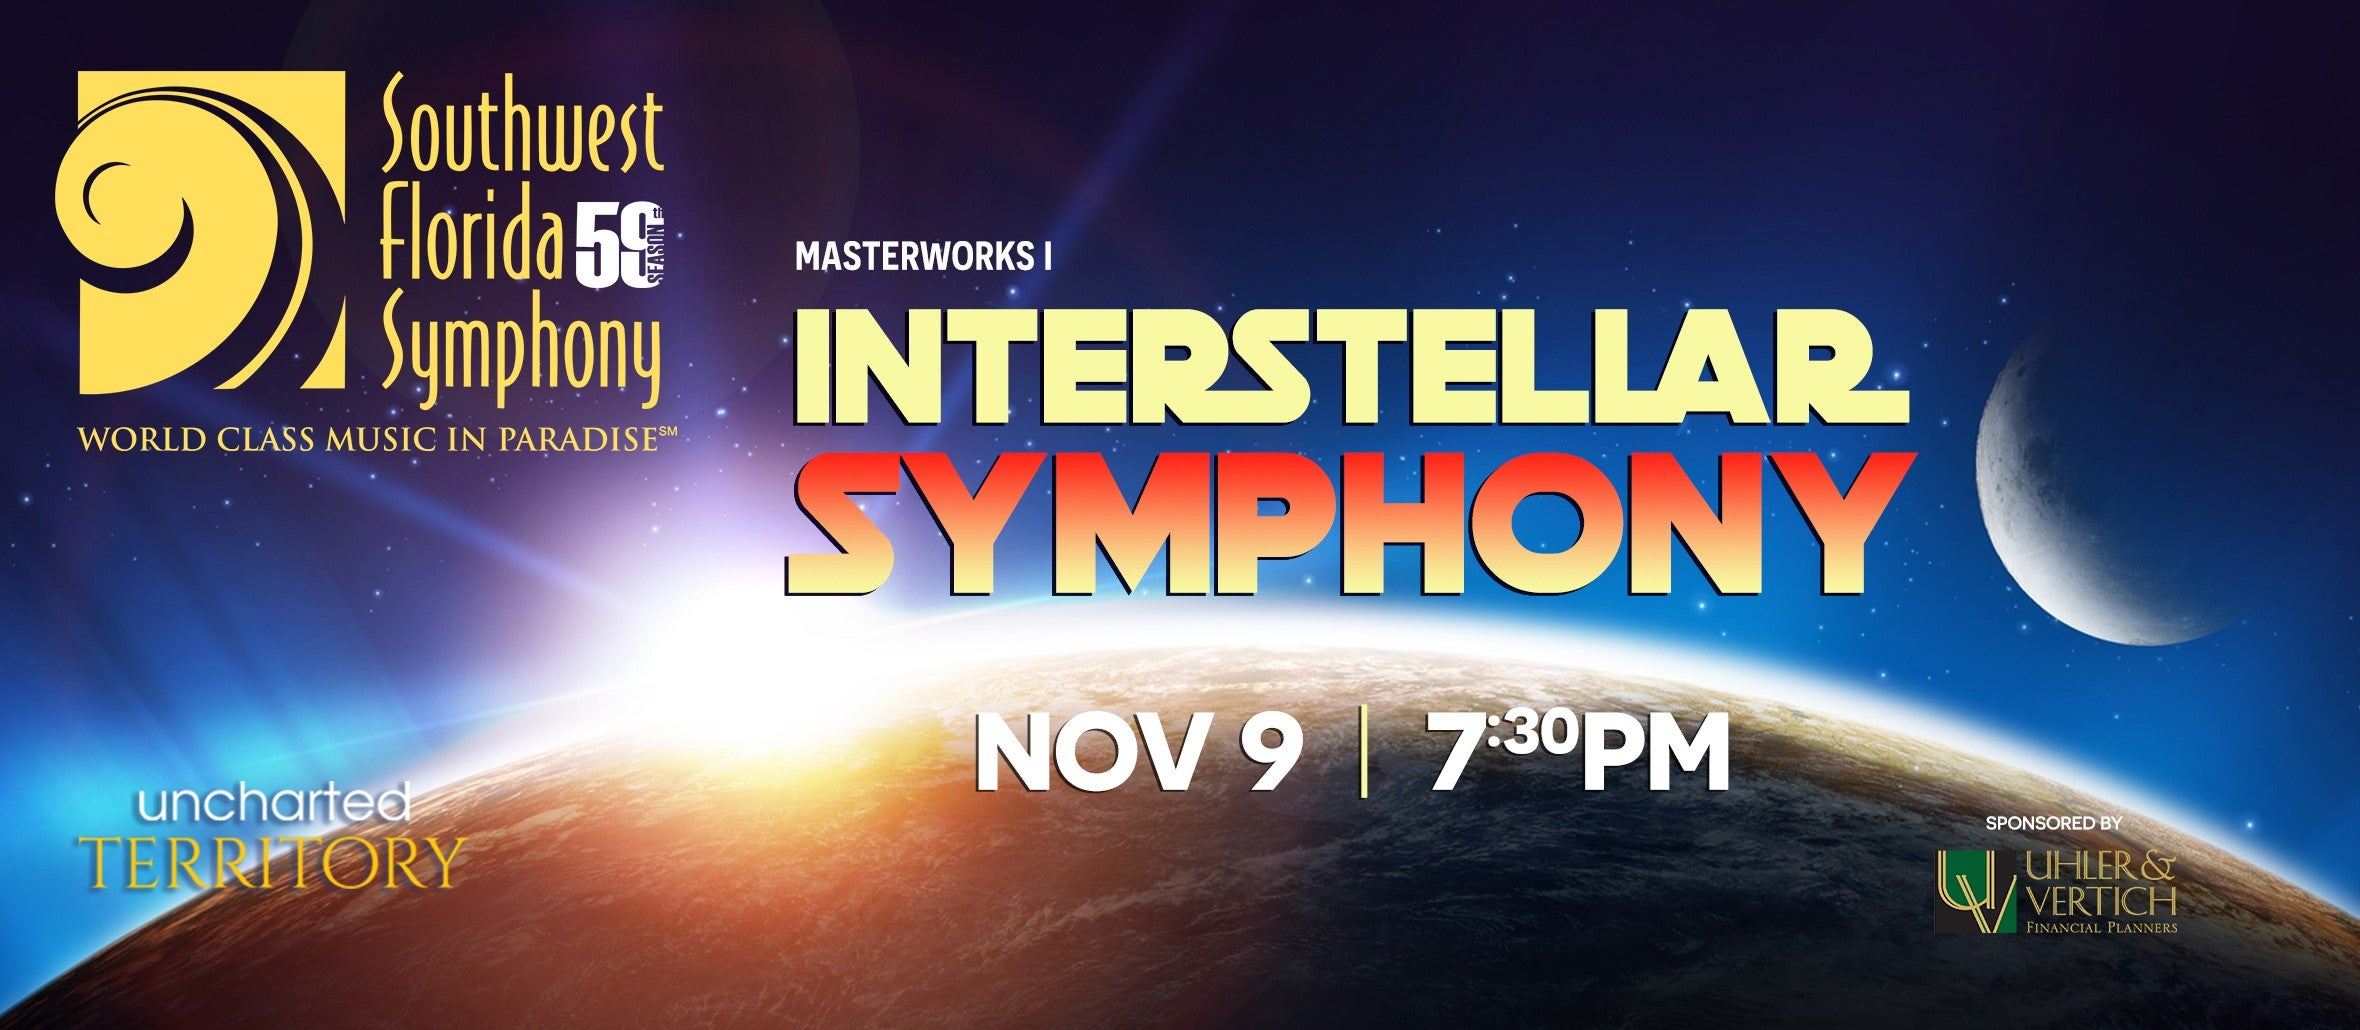 Southwest Florida Symphony: MW1 Interstellar Symphony